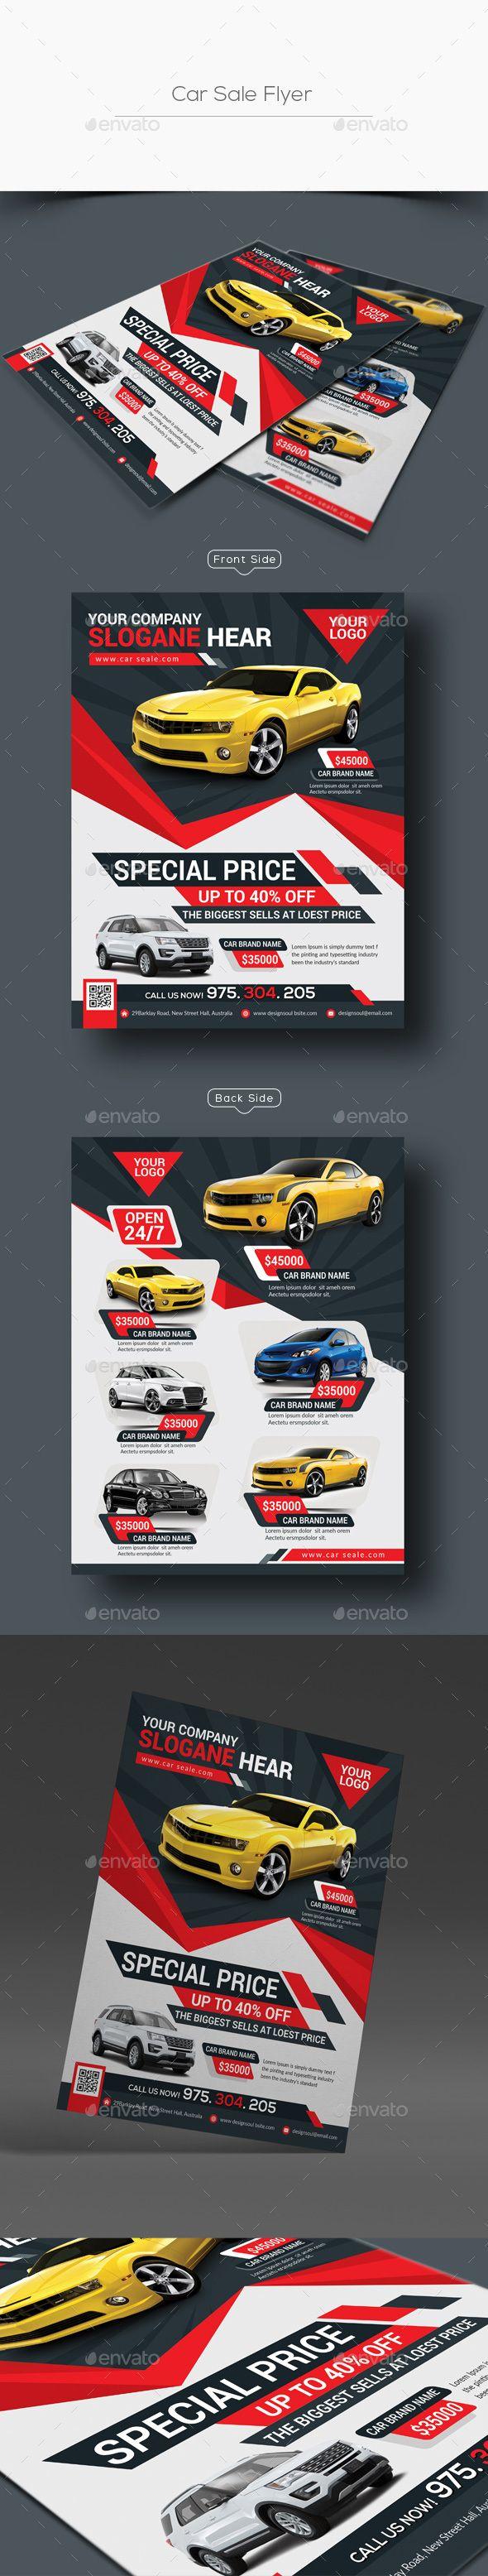 Car Sale Flyer Template PSD. Download here: https://graphicriver.net/item/car-sale-flyers/17382019?ref=ksioks